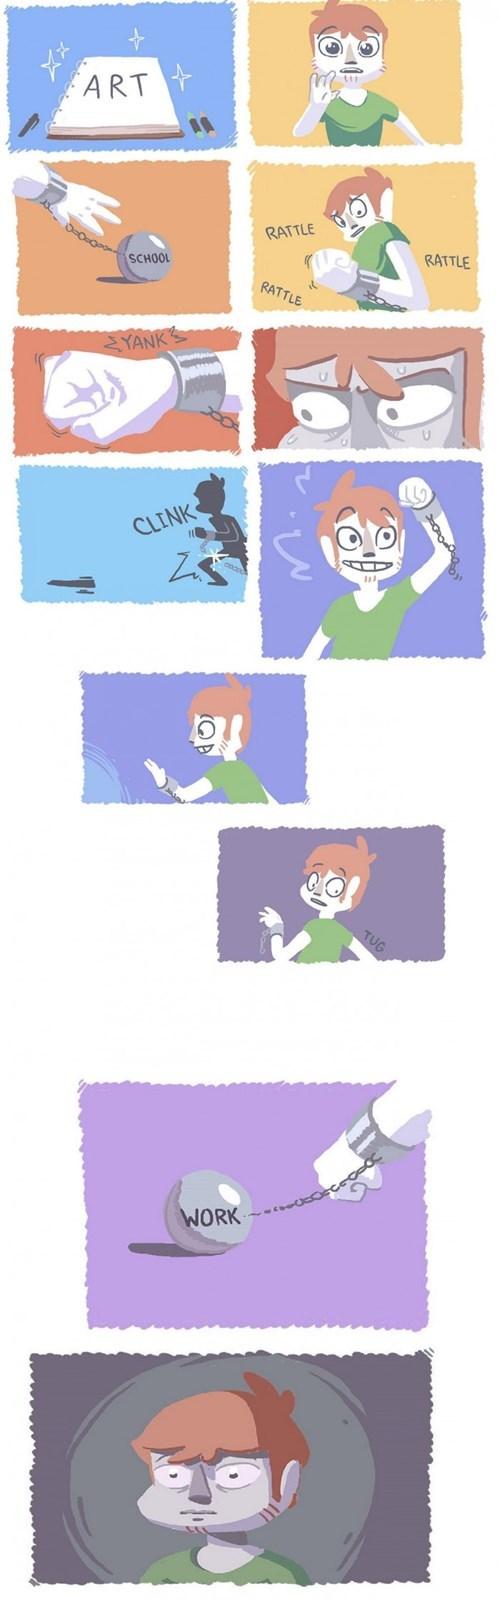 school art web comics - 8406001152